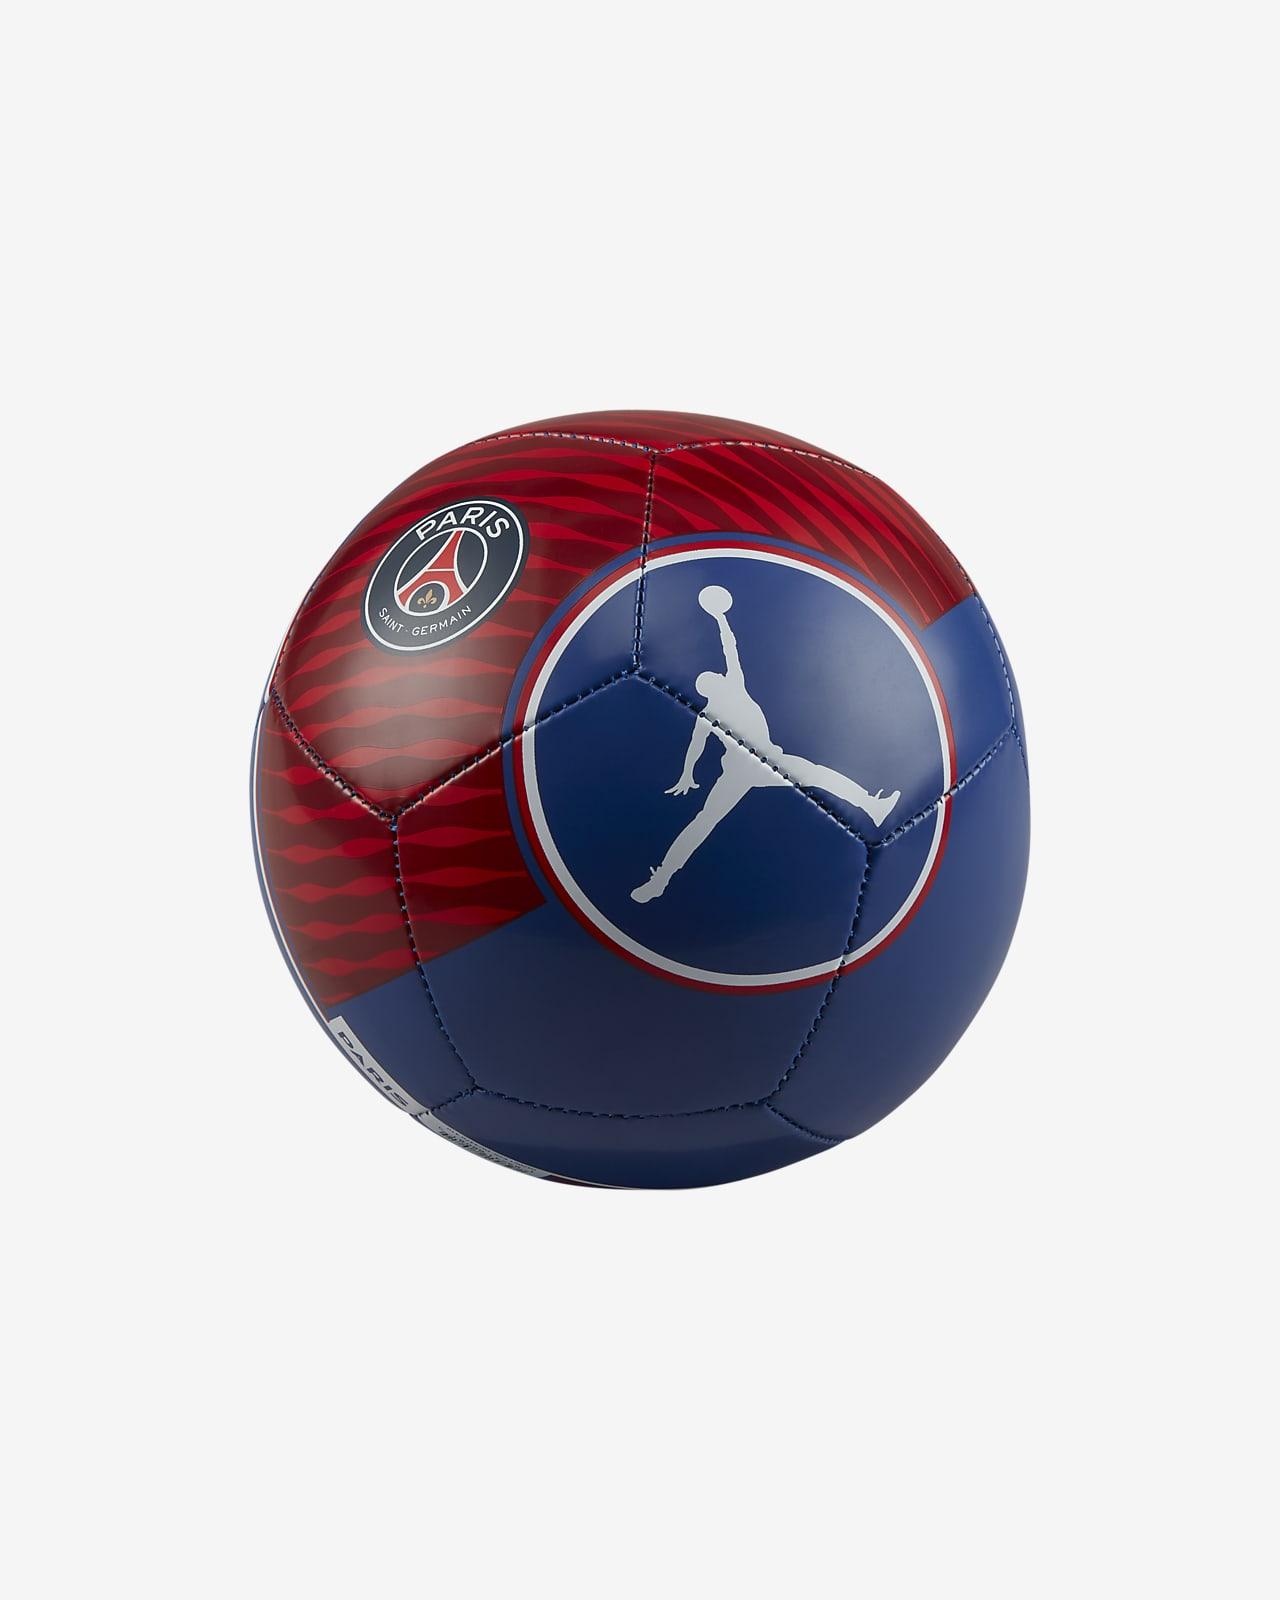 Jordan x Paris Saint-Germain Skills futball-labda